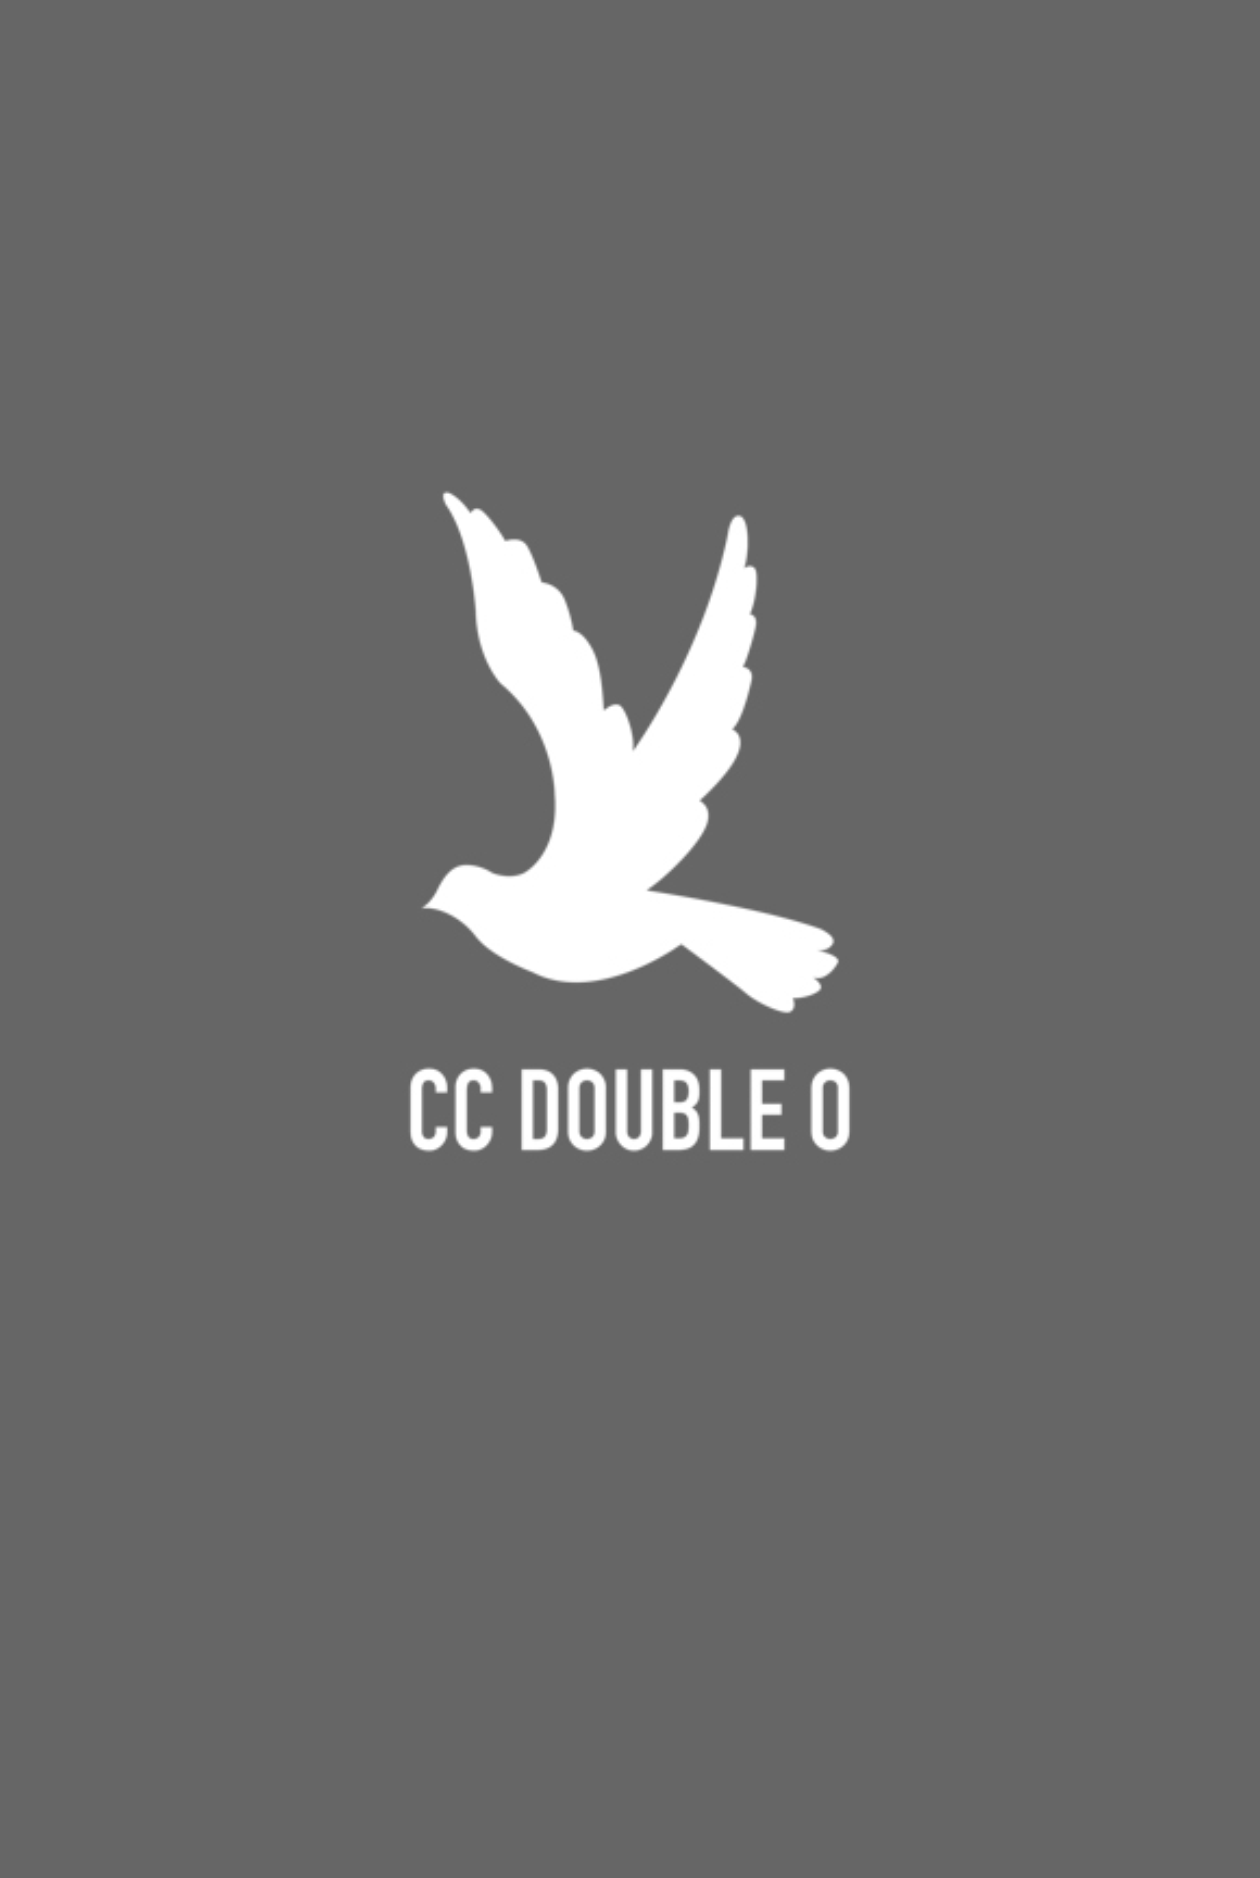 Bird Logo Bomber Jacket